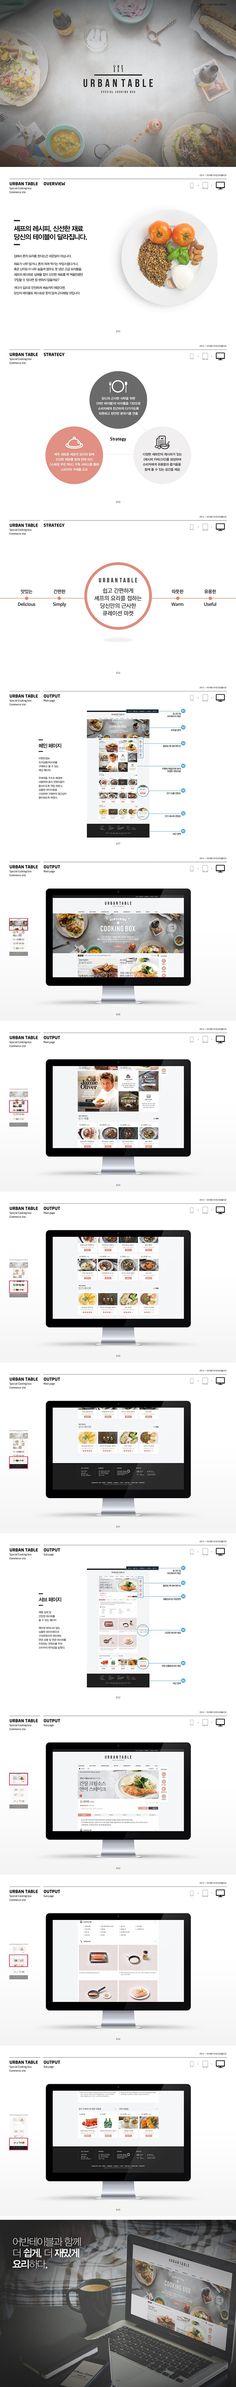 URBAN TABLE 쉽고 간편하게 셰프의 요리를 접하는 당신만의 근사한 큐레이션 마켓 , 무채색을 주조로 배경에 사용하여 음식 컨텐츠들이 돋보이도록 작업한 웹페이지 수강 과정 WMGS 웹디자인 스페셜리스트 29기 수강생이름 이지혜 Book Design, Layout Design, Menu Board Design, Homepage Design, Promotional Design, Slide Design, Website Design Inspiration, Presentation Design, Design Reference